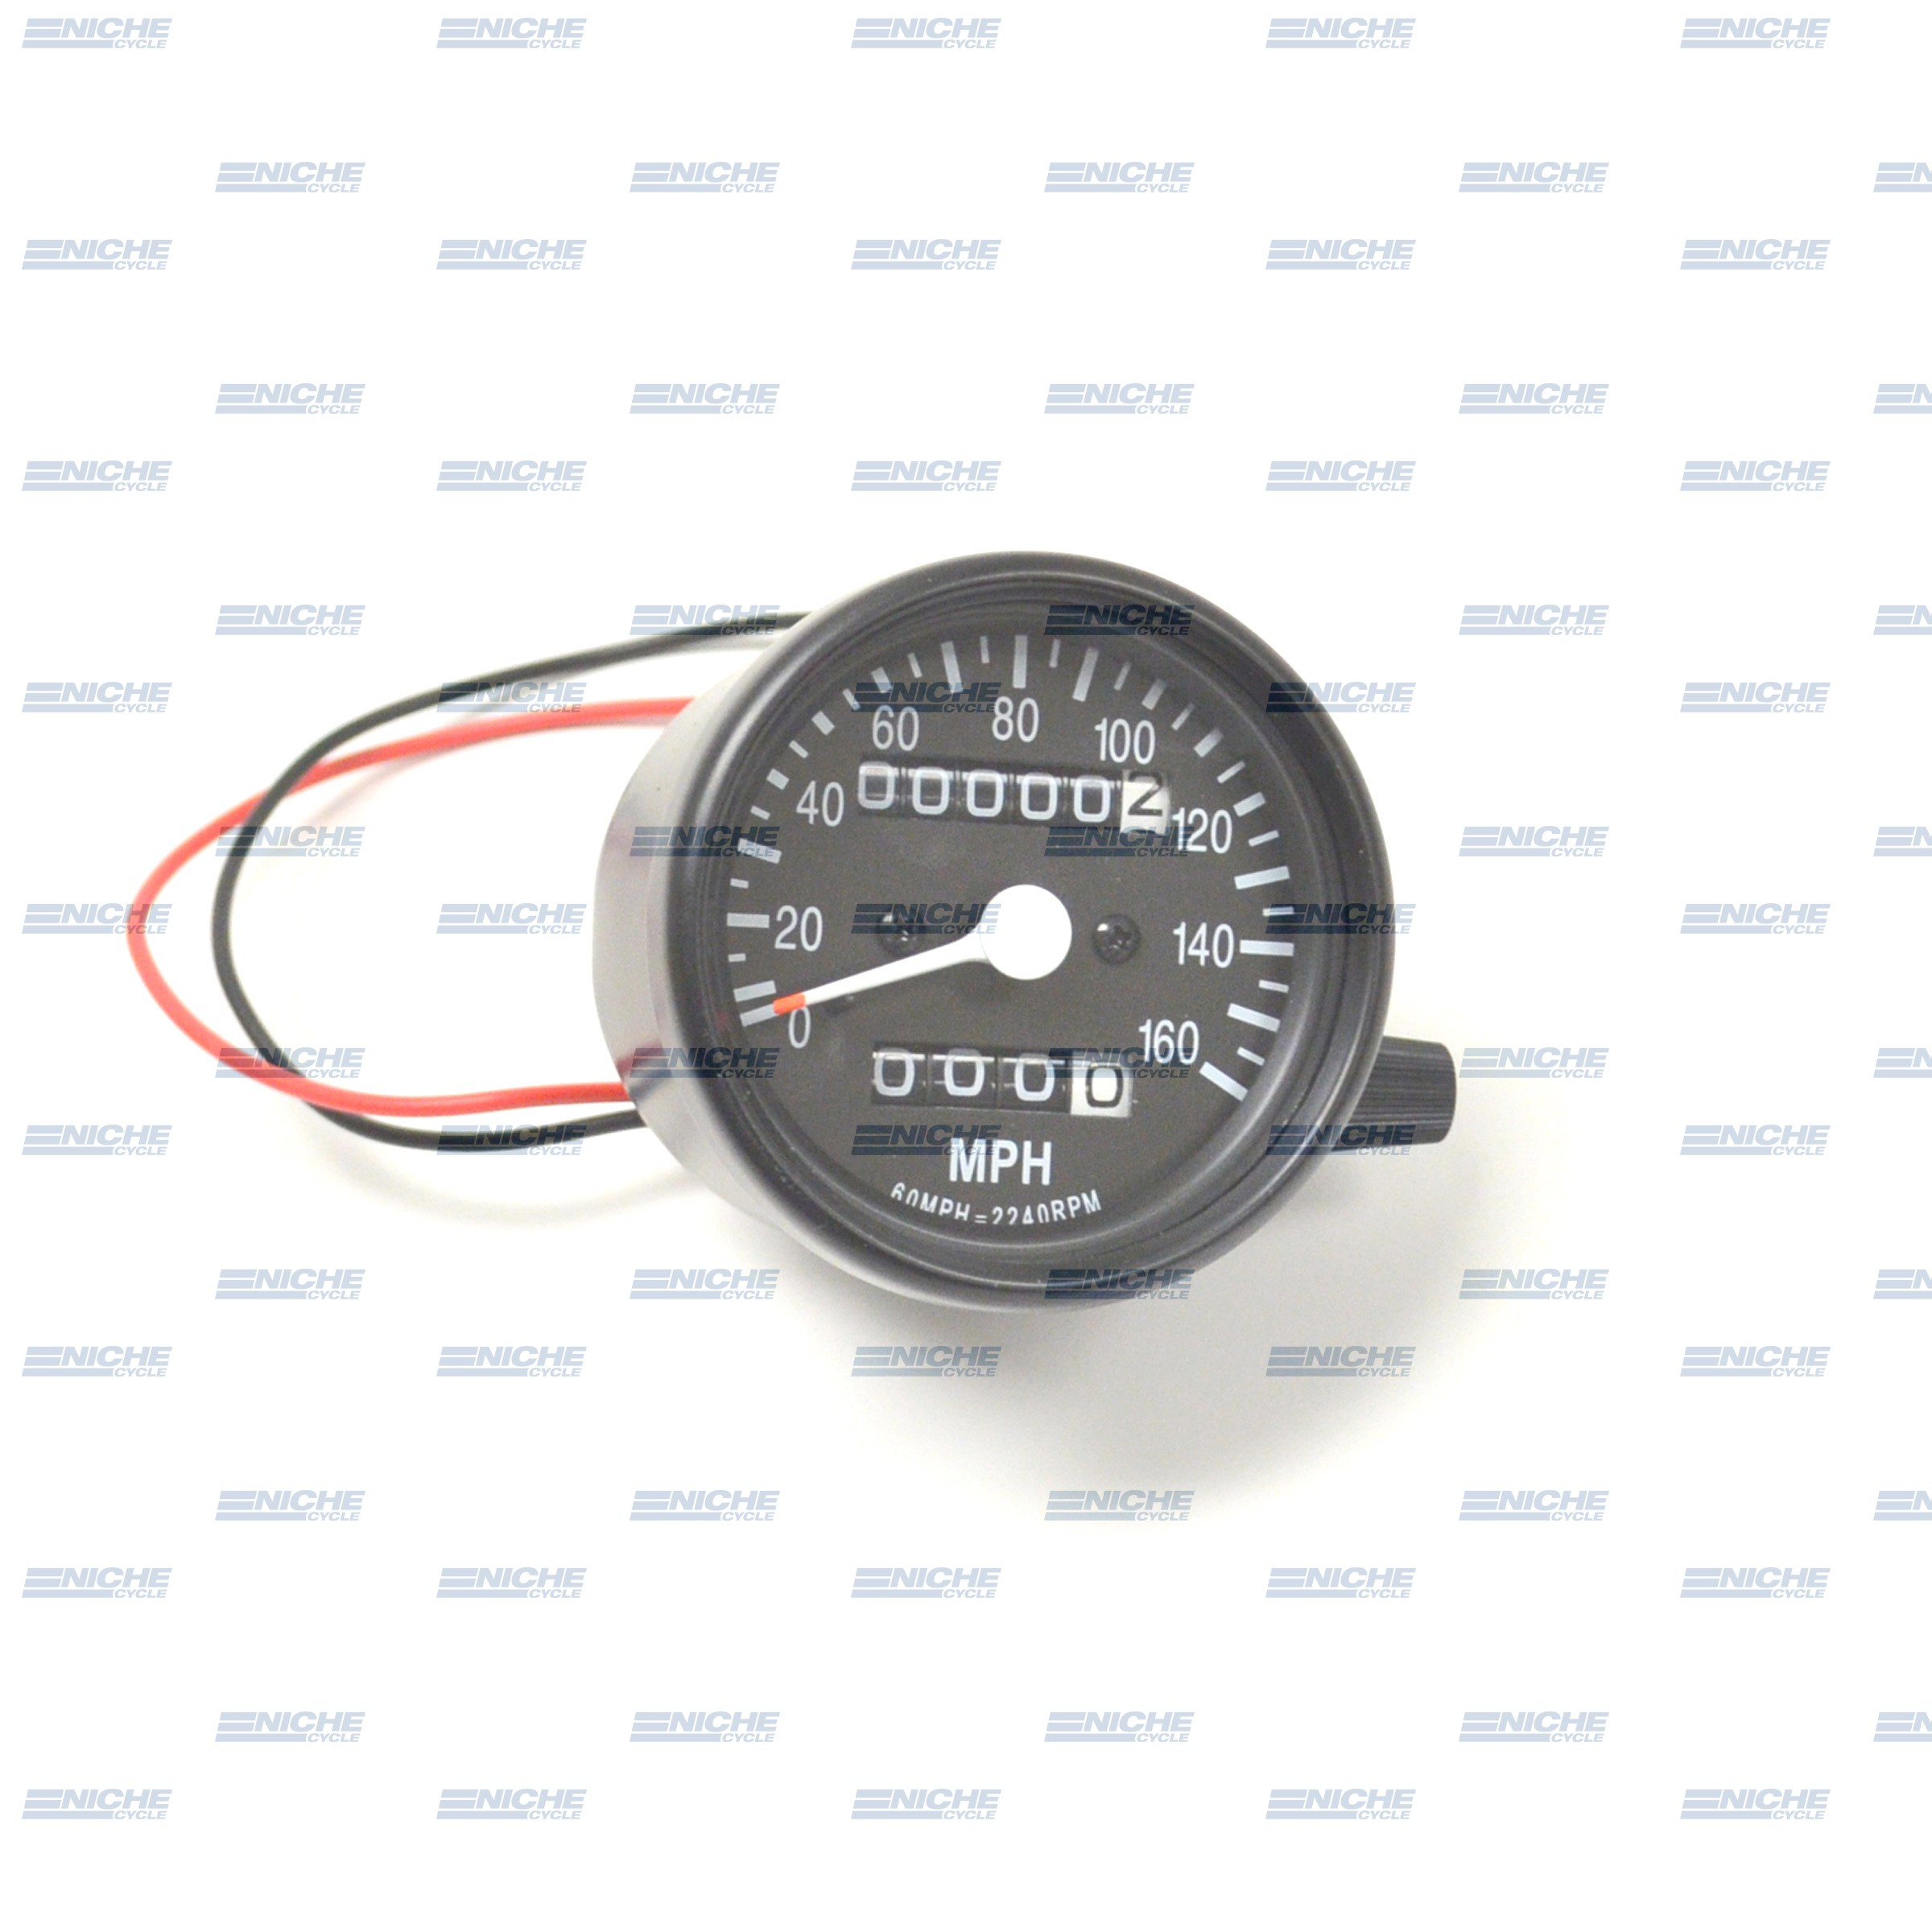 Mini Speedo 2.1:1 ODO/Trip Black 58-43669B